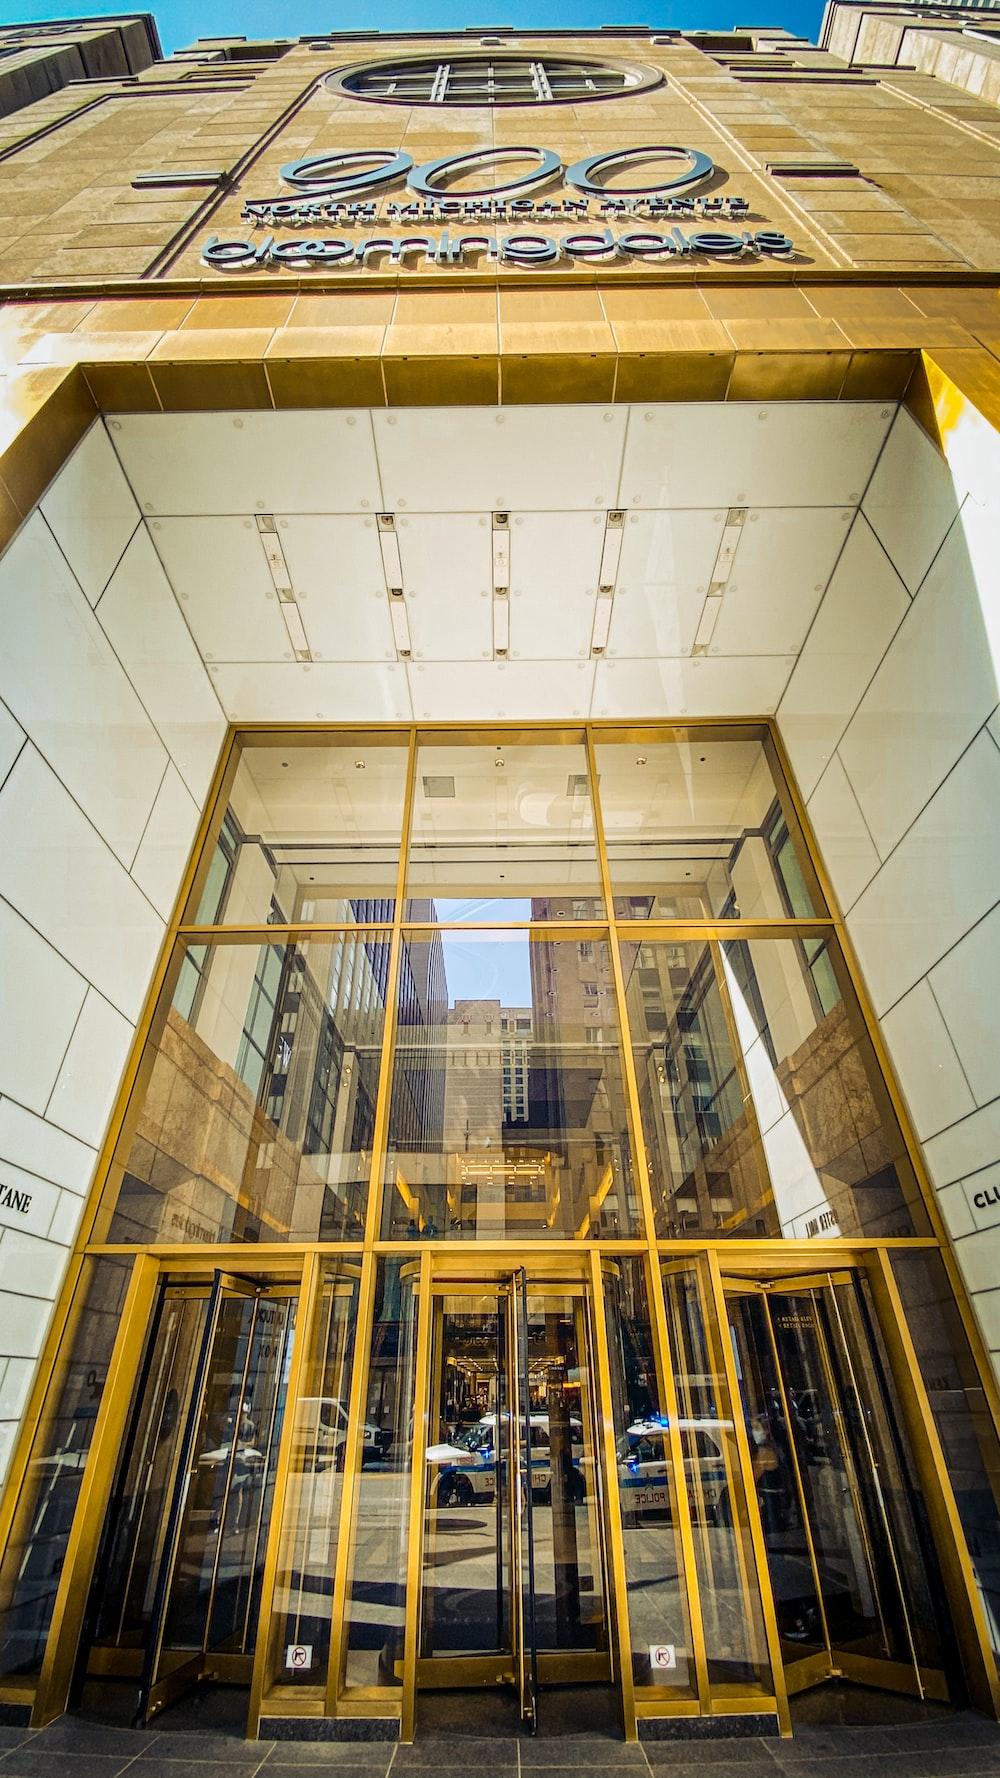 brown wooden framed glass windows